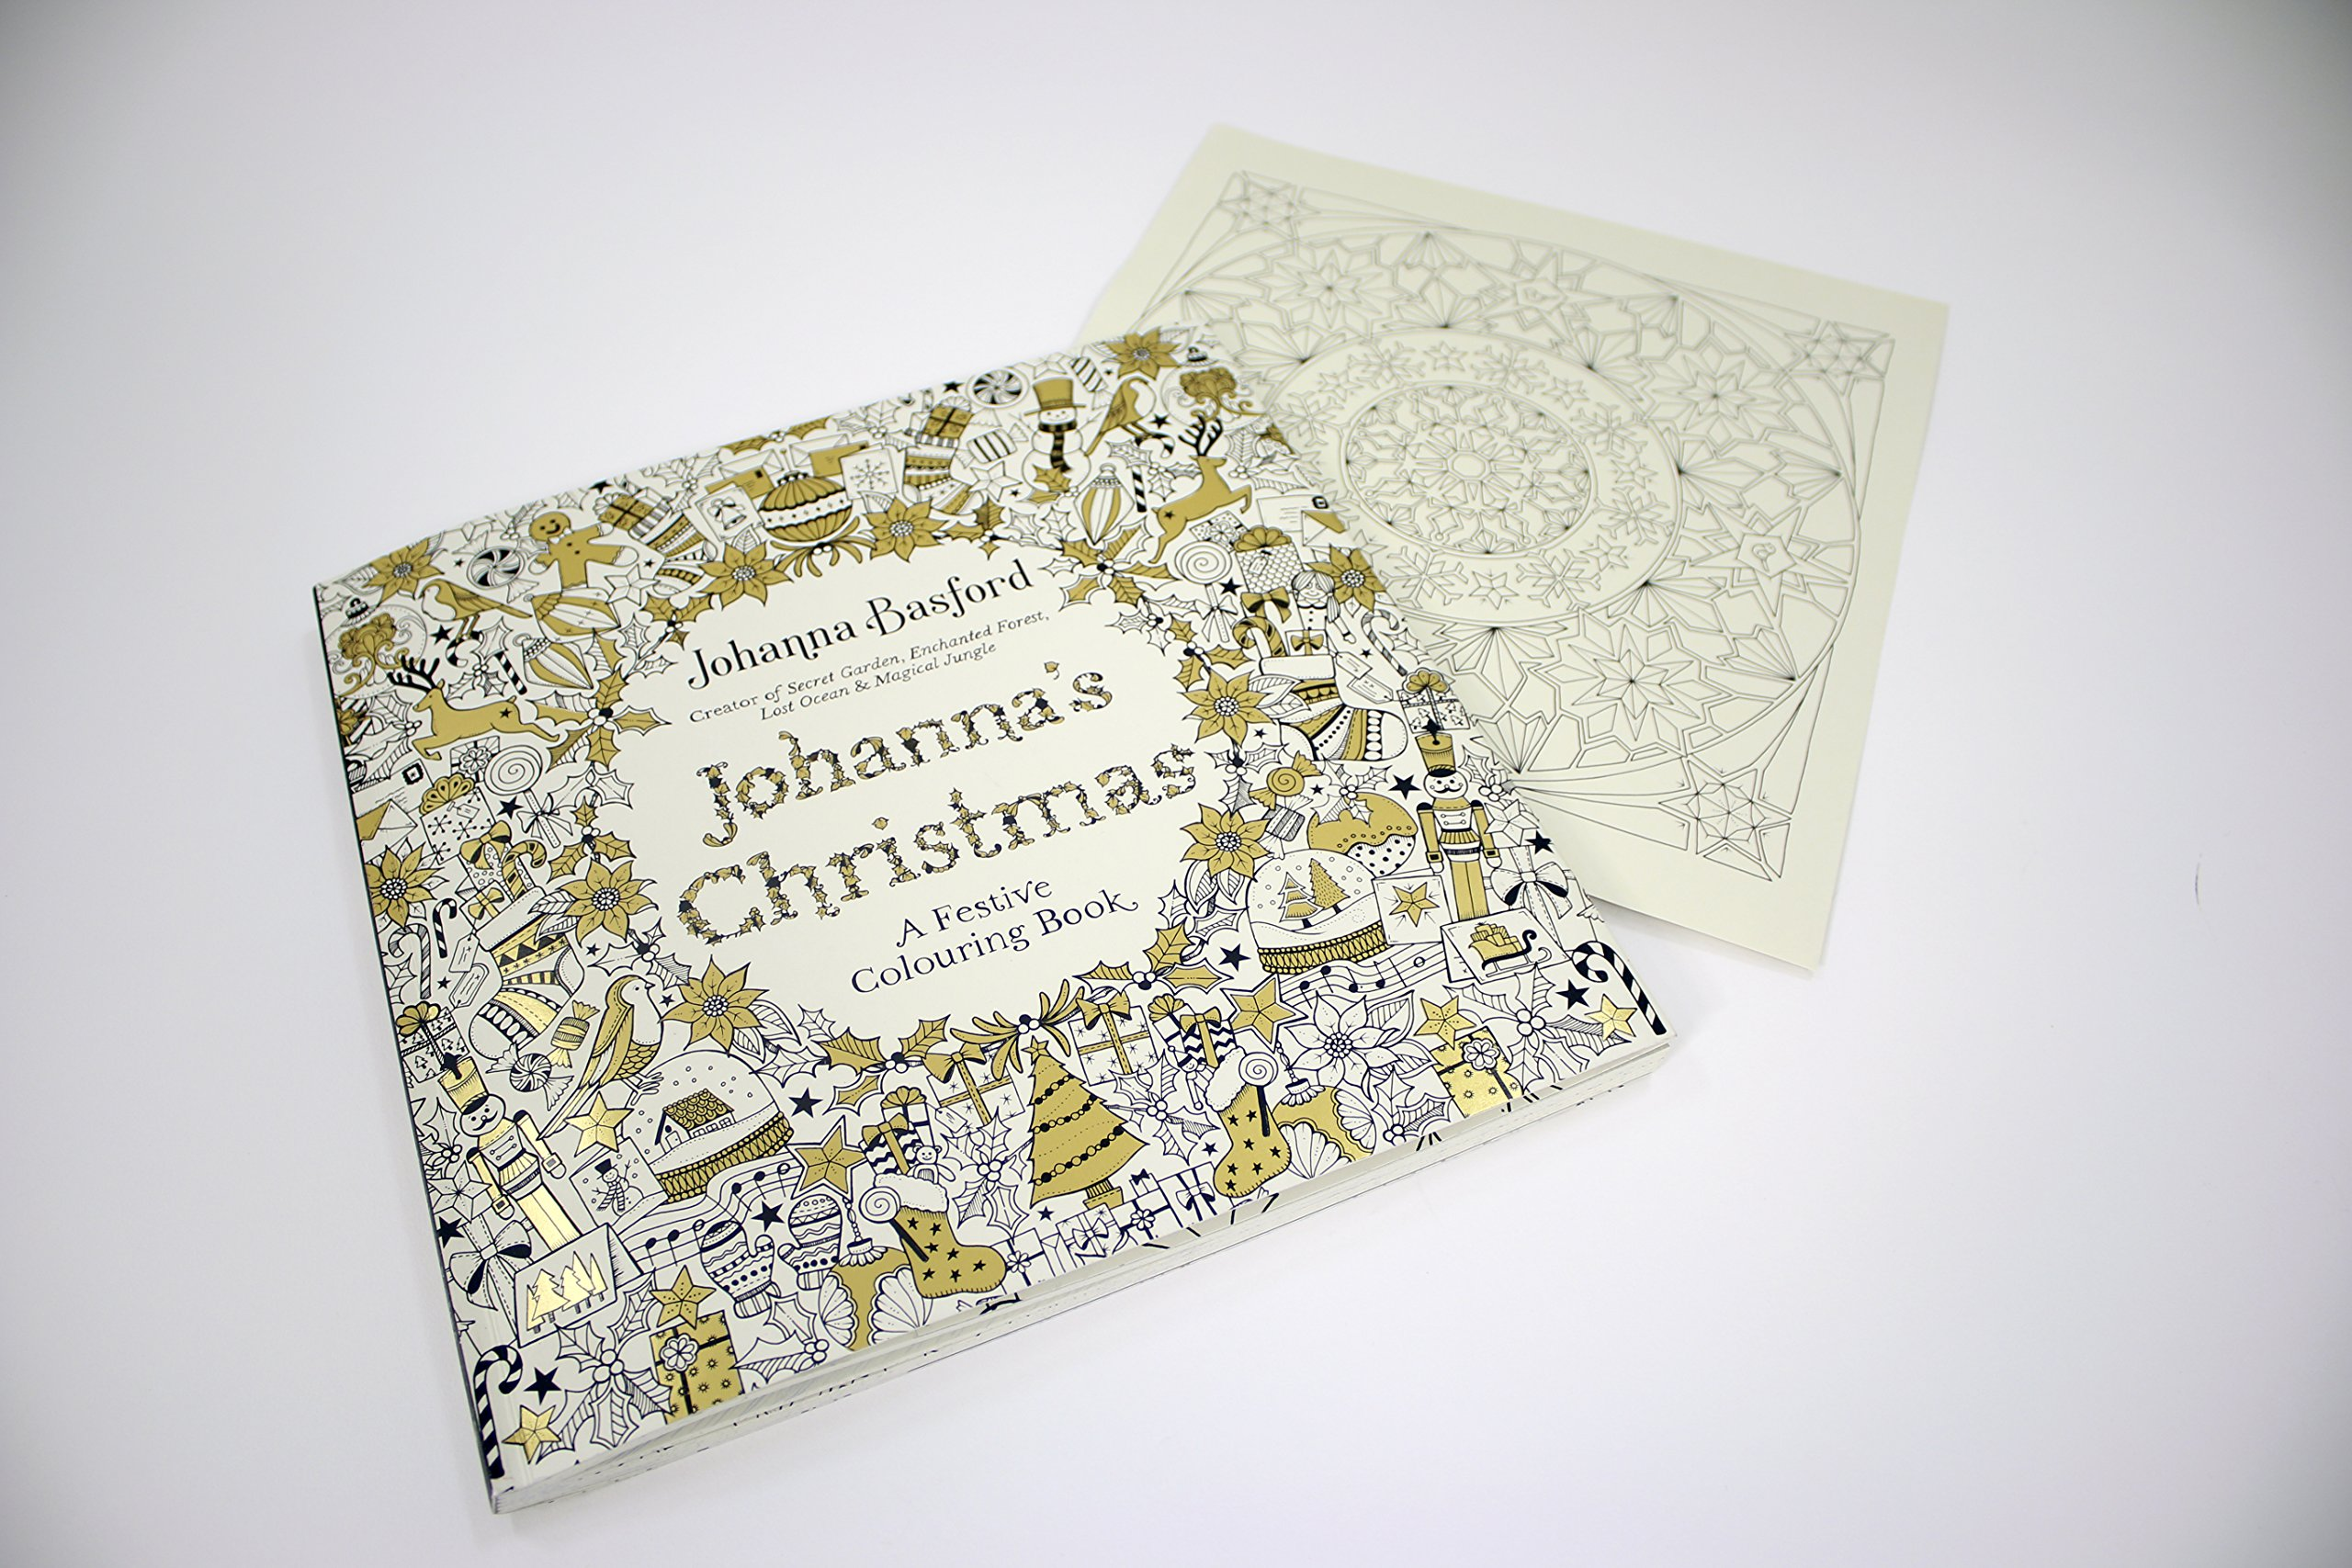 johanna u0027s christmas a festive colouring book colouring books